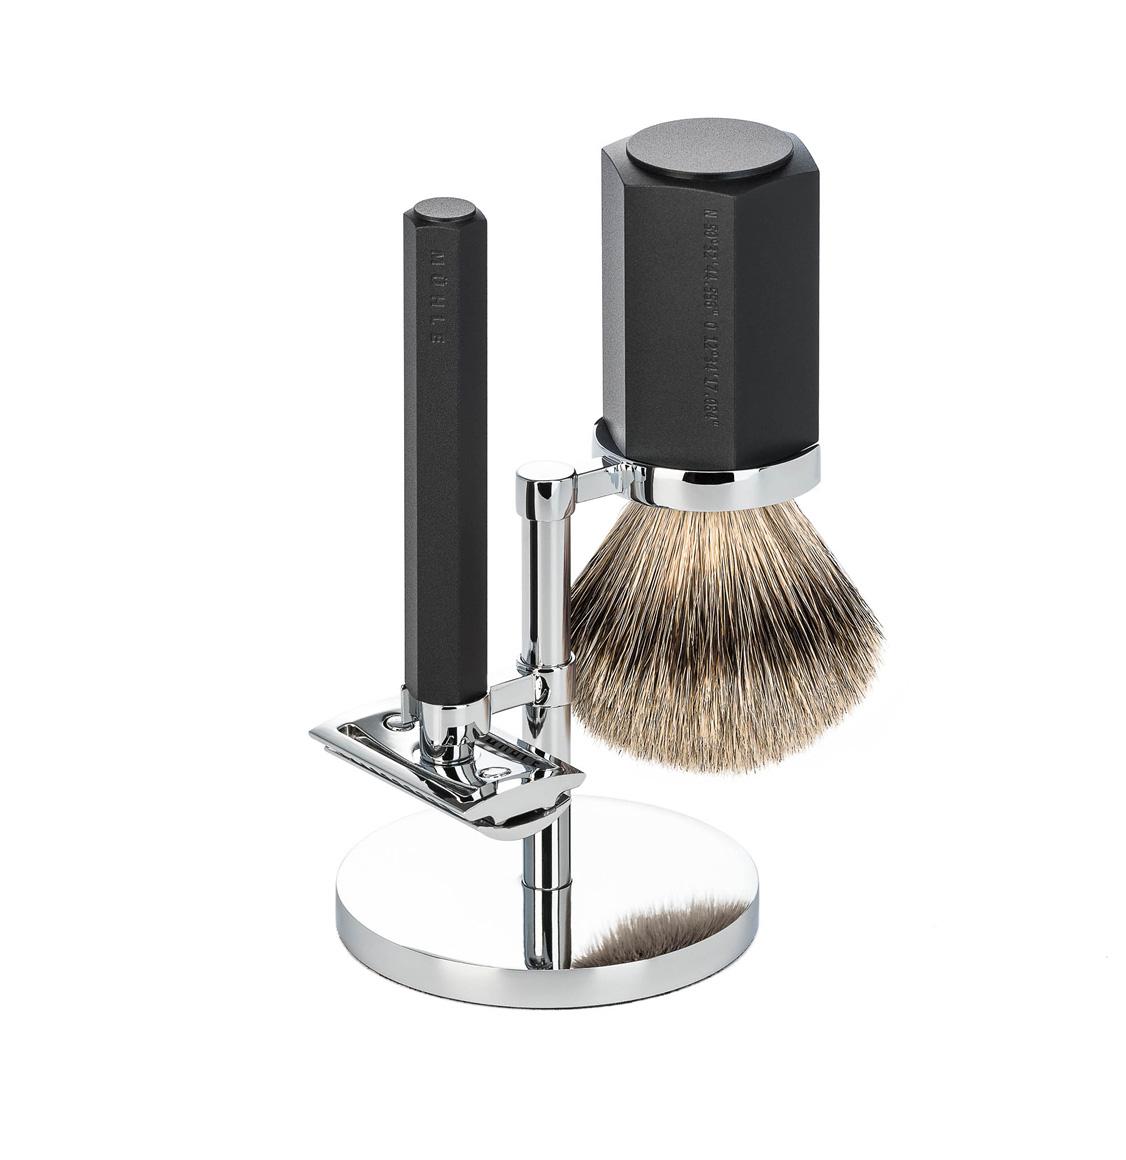 Muhle Hexagon Shaving Set Silvertip Badger Brush With Safety Razor